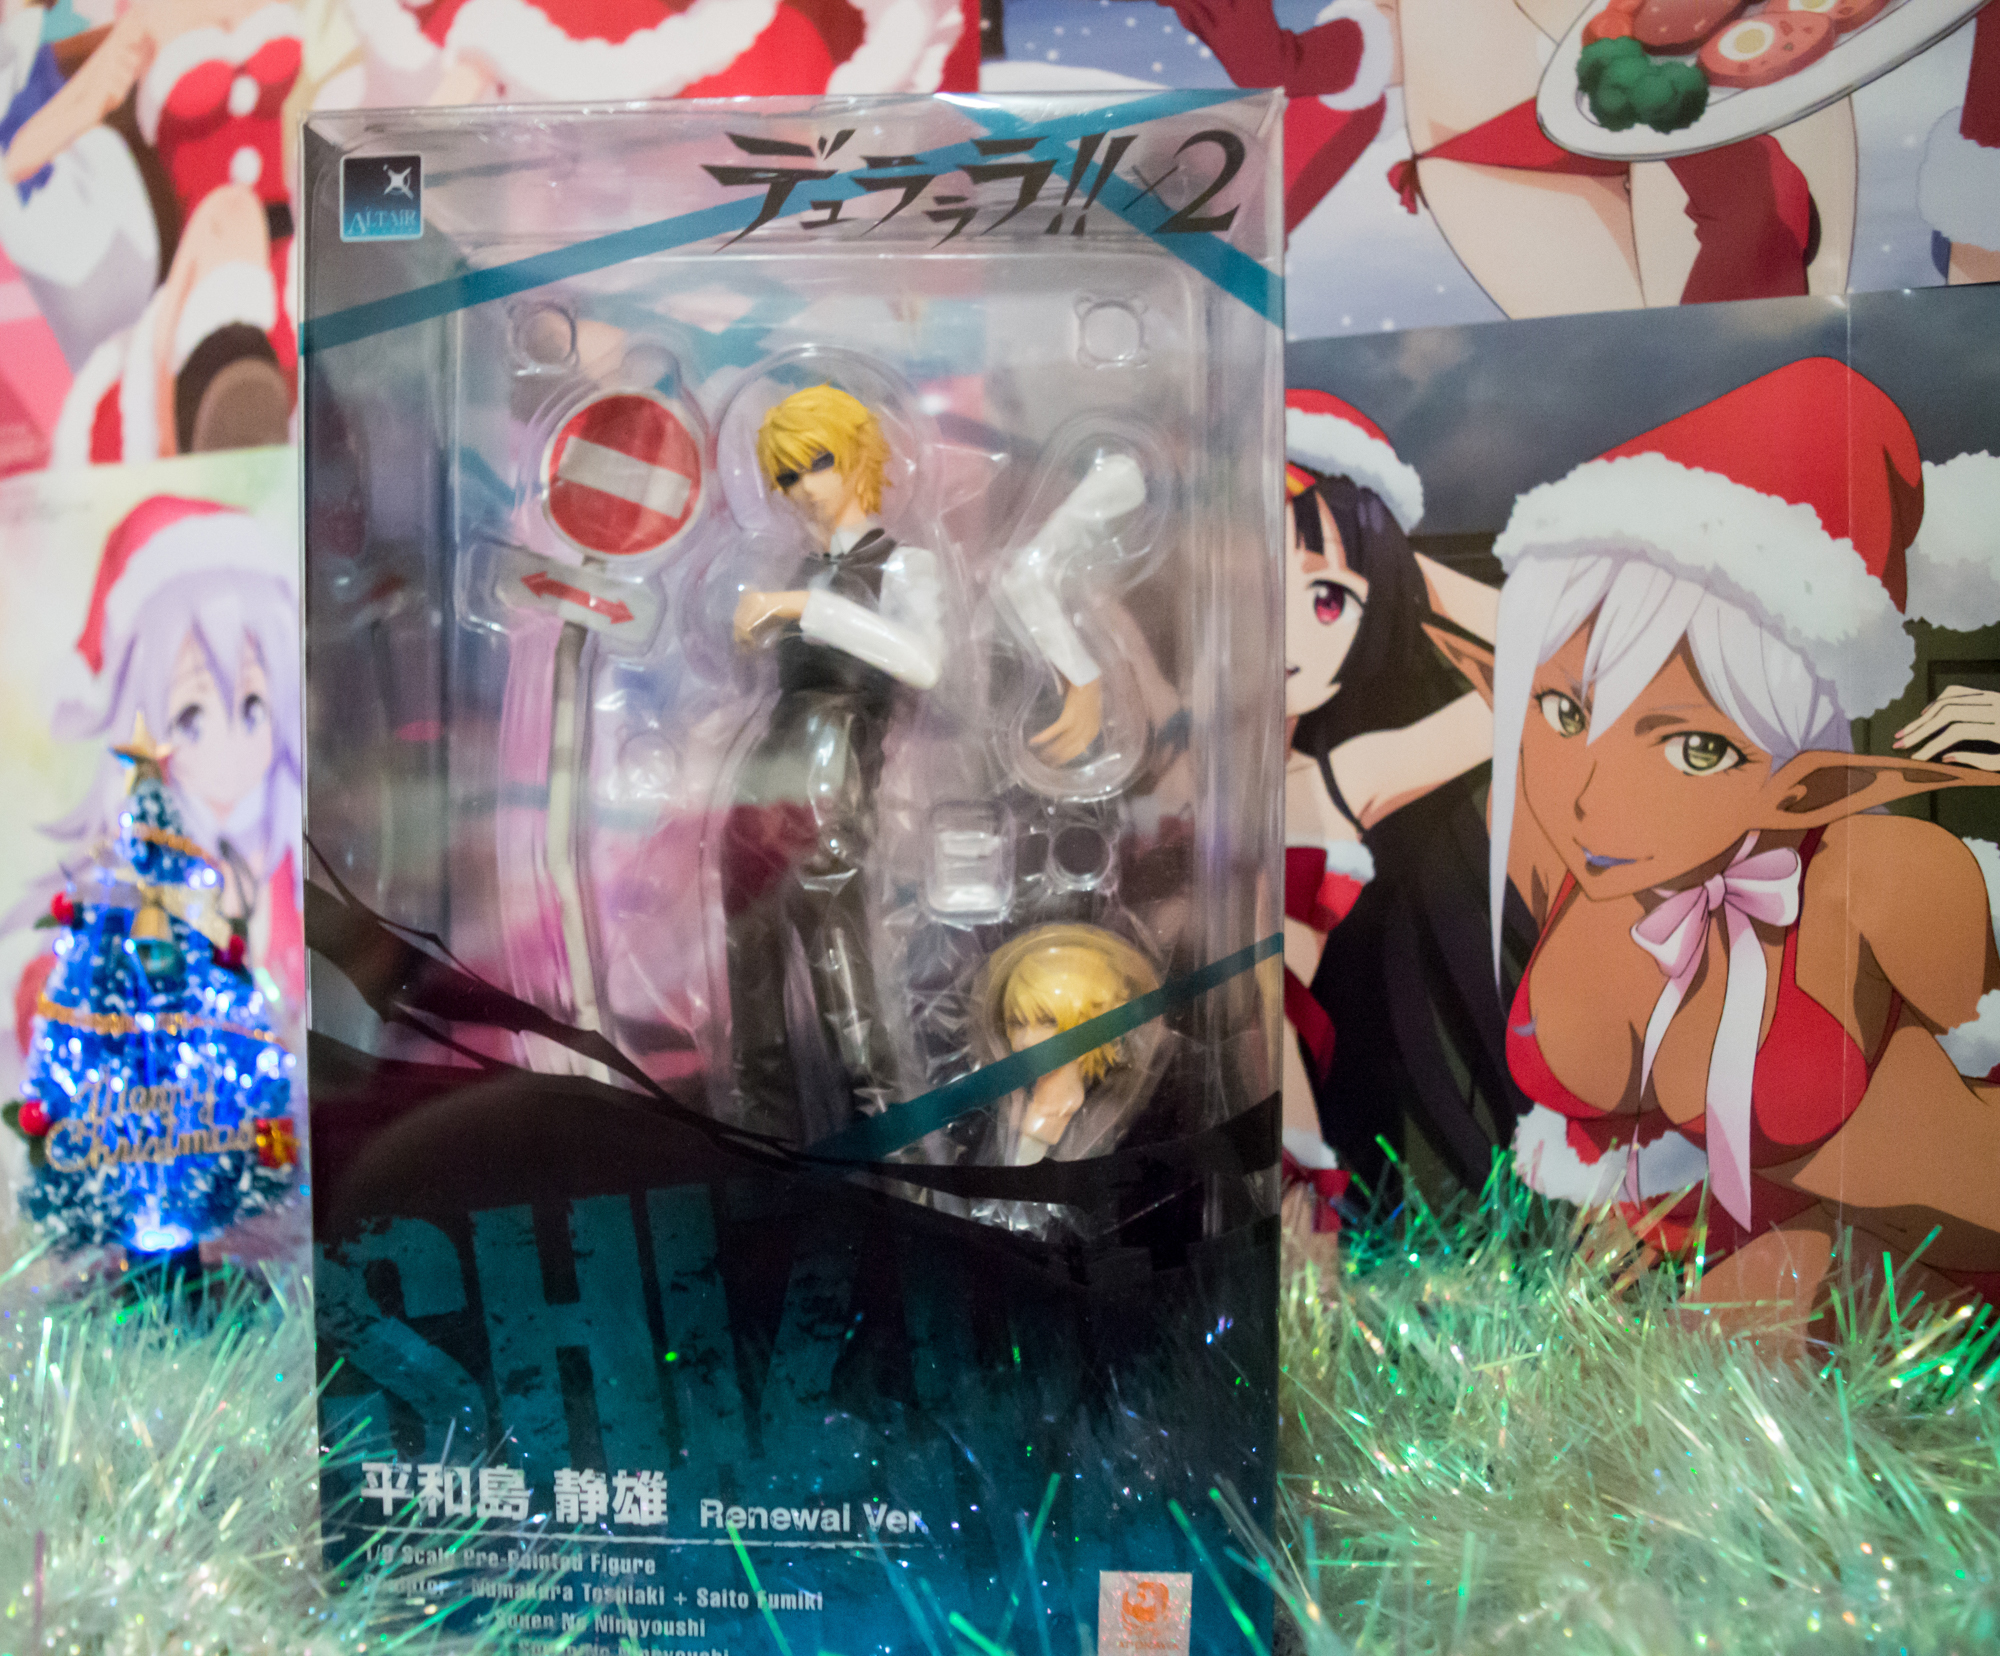 Anime Toy Lucky Grab Fuku-Bukuro 2016 Bag From JList 0002